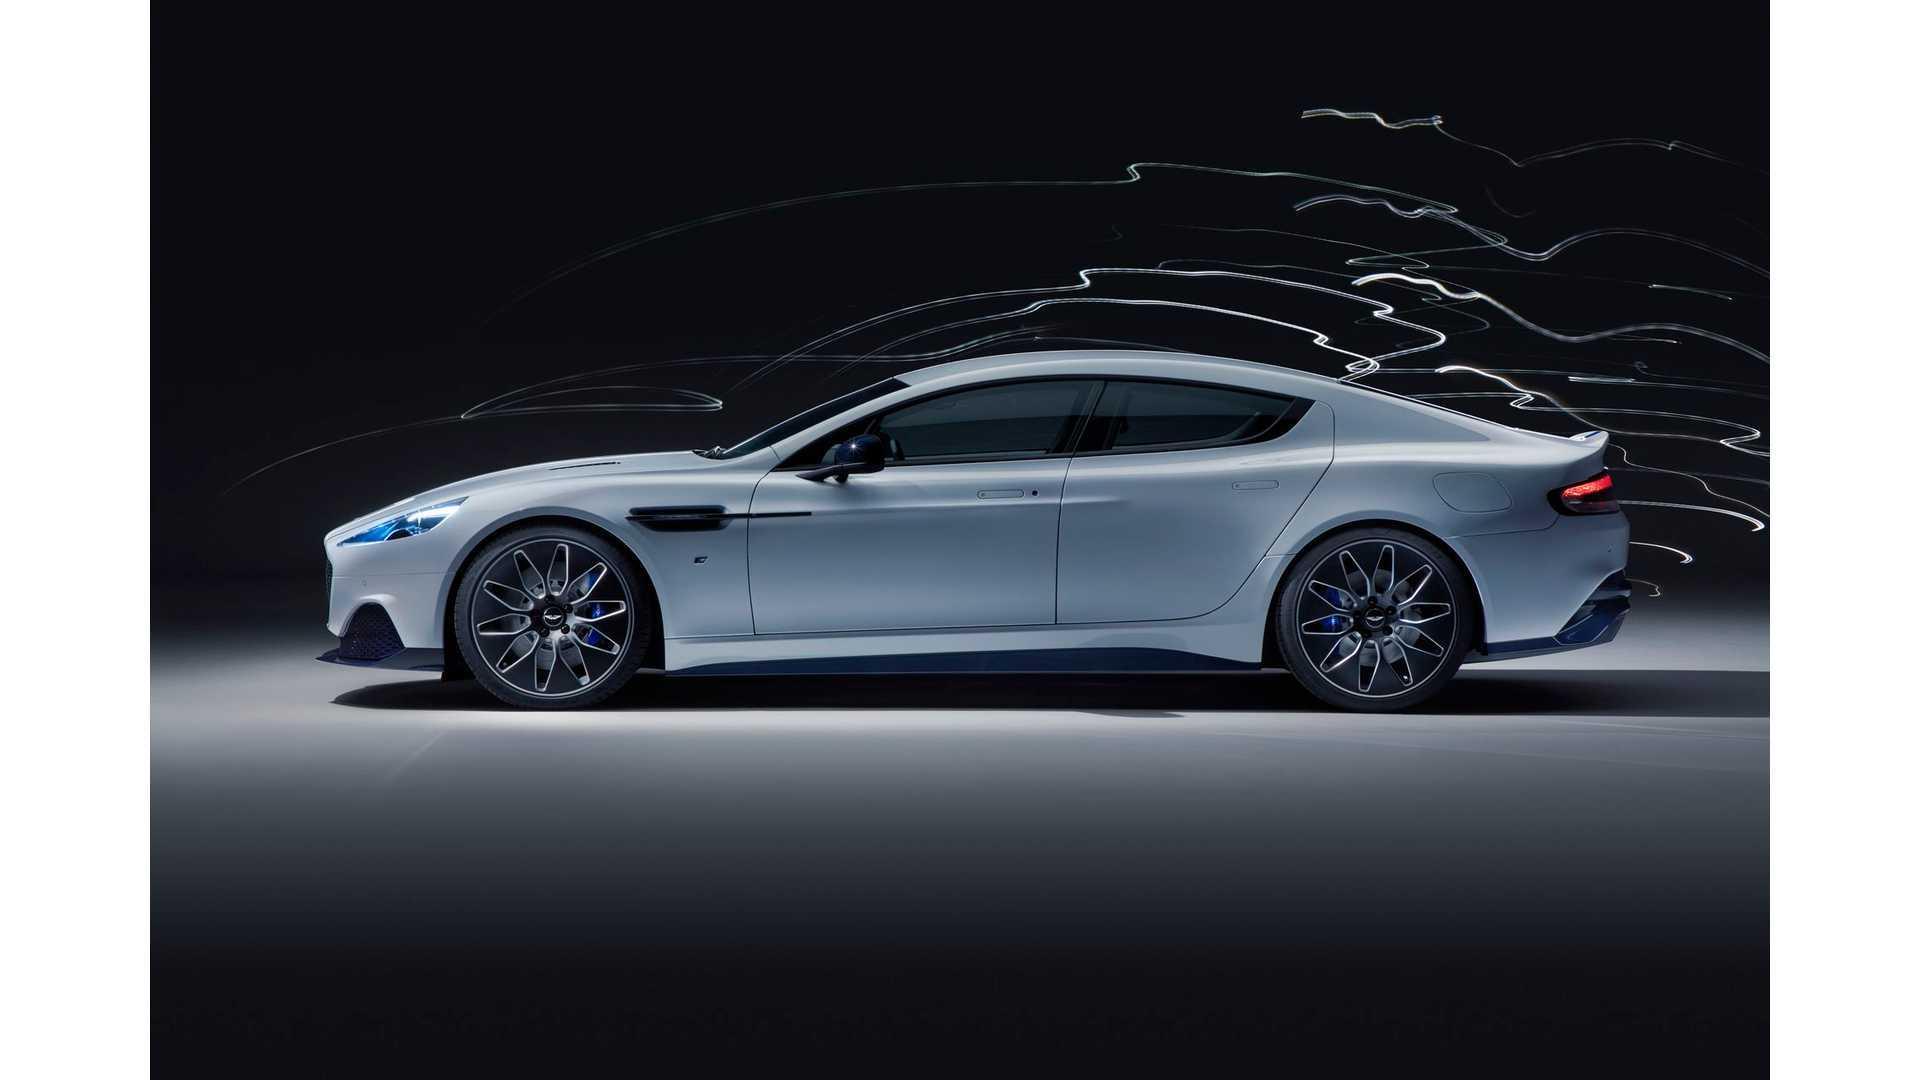 Aston Martin Rapide E Debuts At 2019 Shanghai Auto Show Video Motor1 Com Bilder